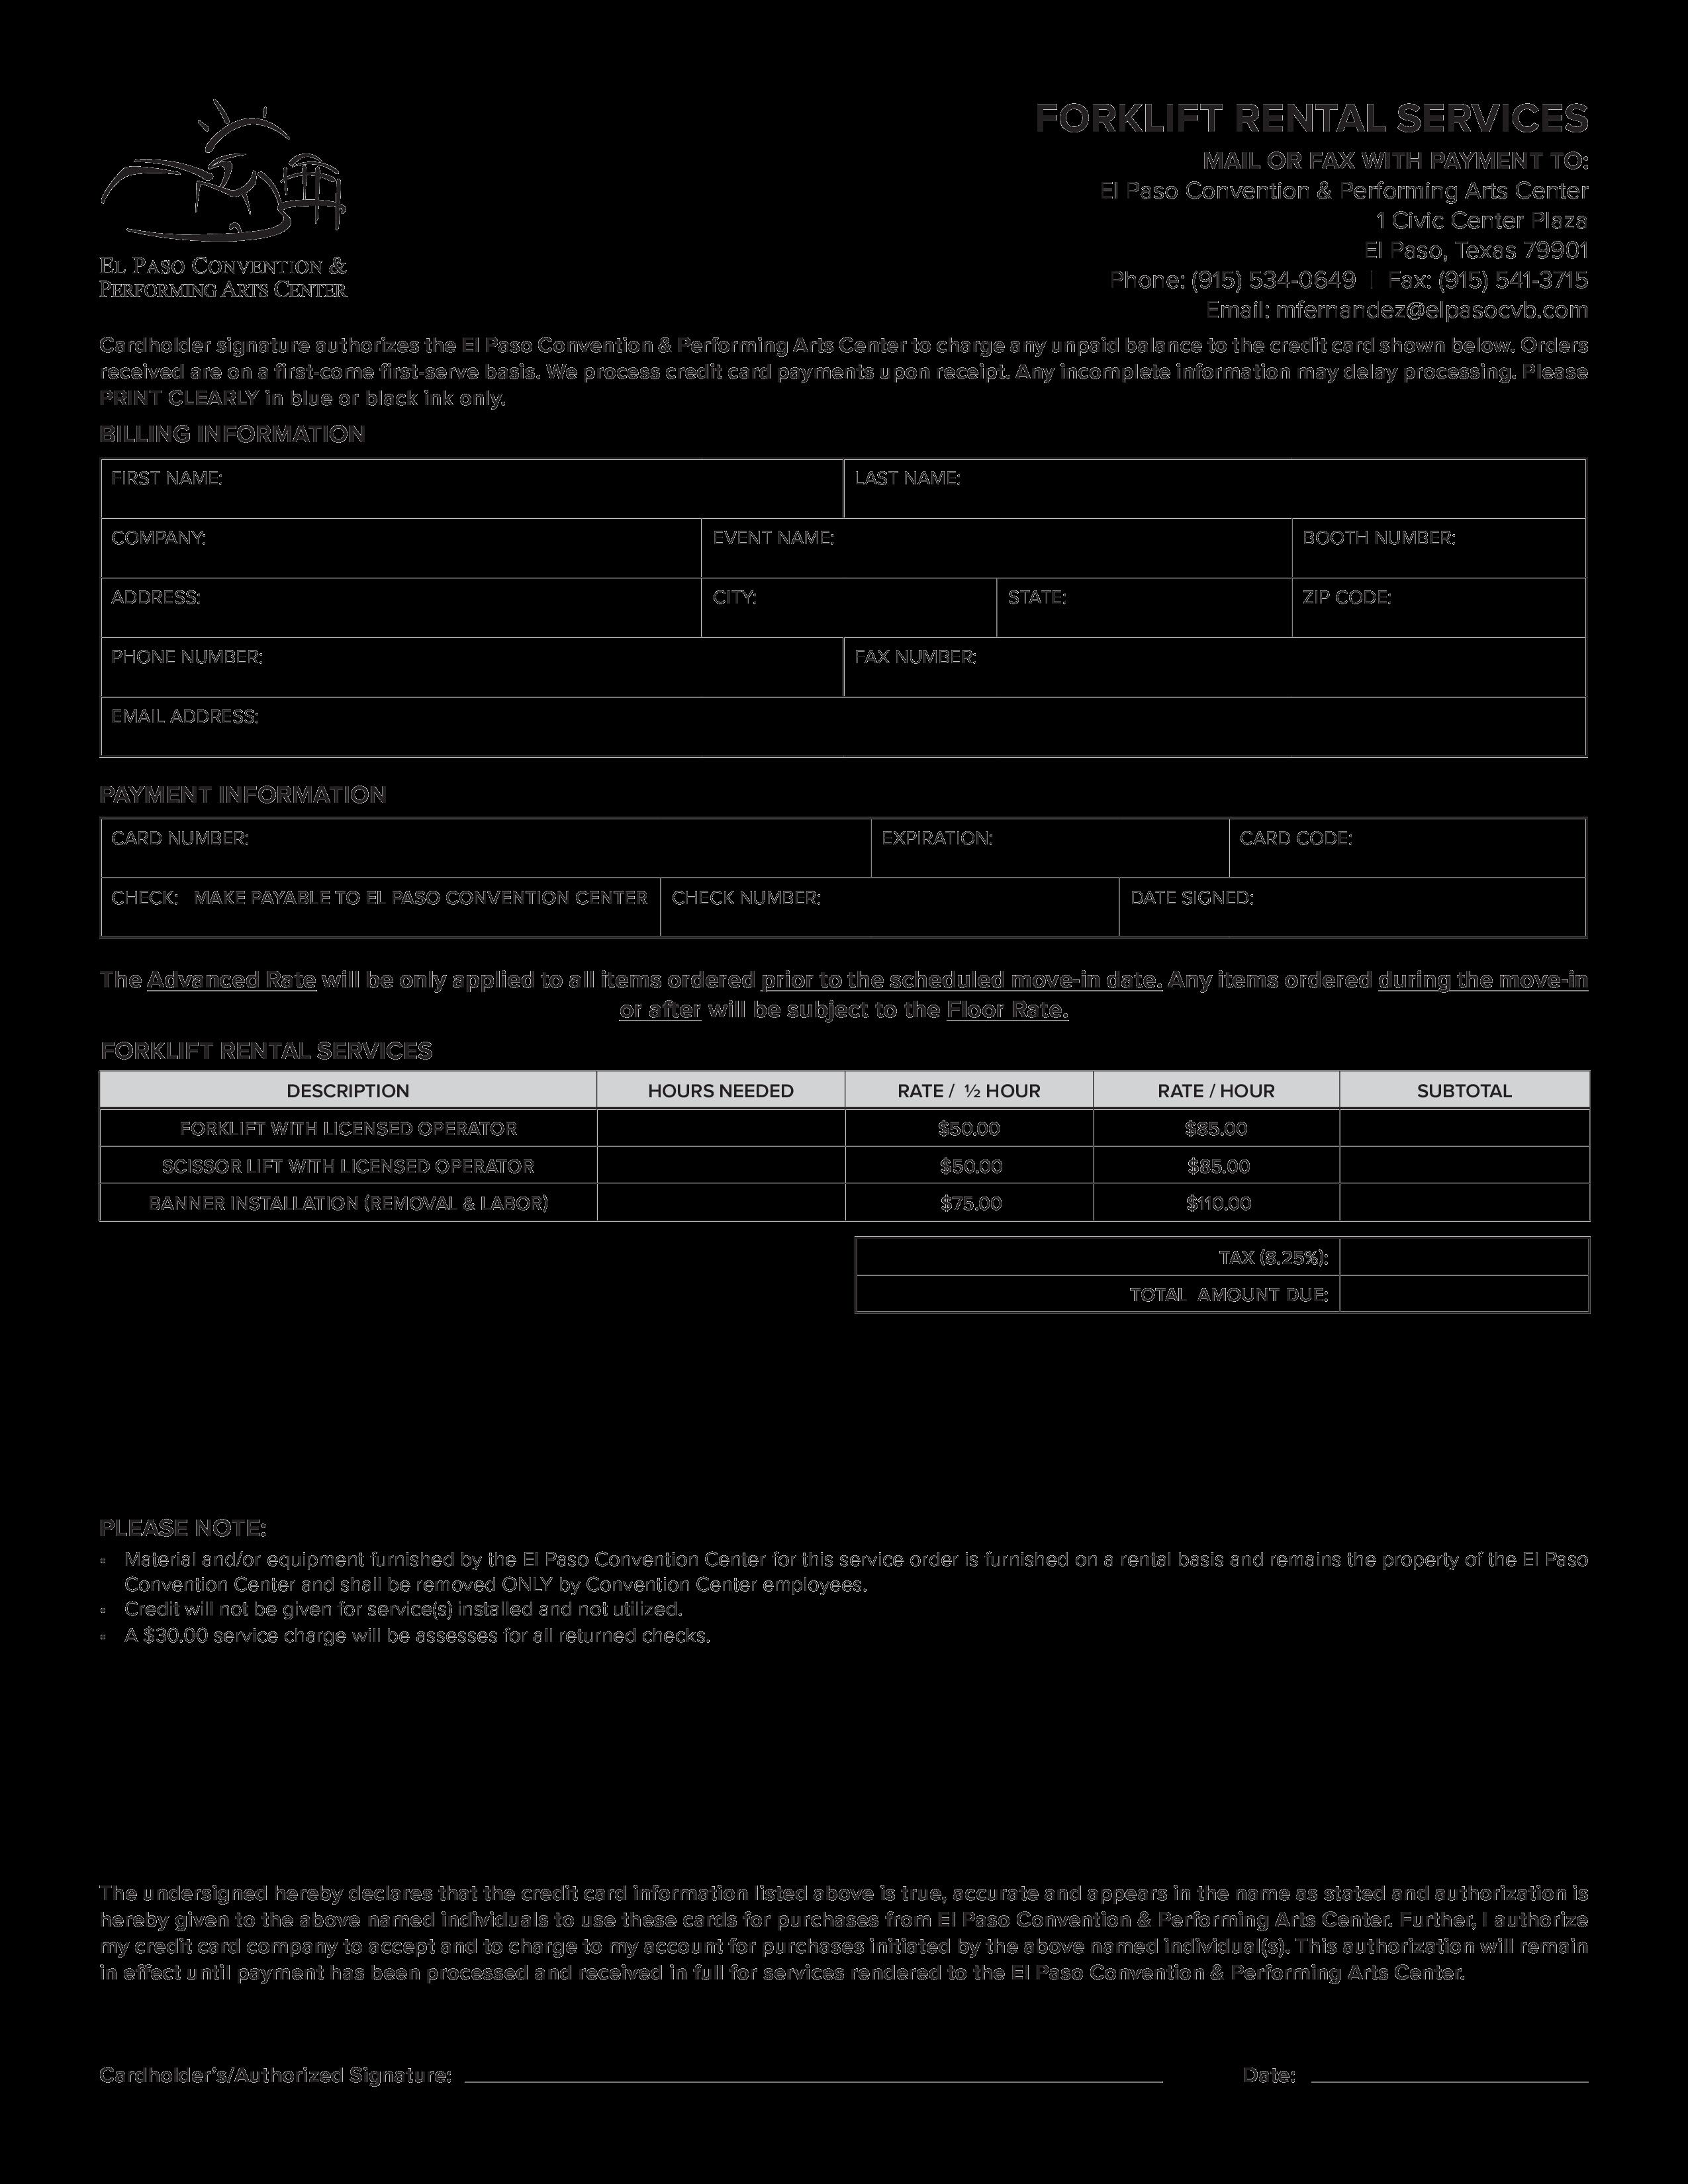 免费Rental Services Order Form Pdf Template | 样本文件在 ...